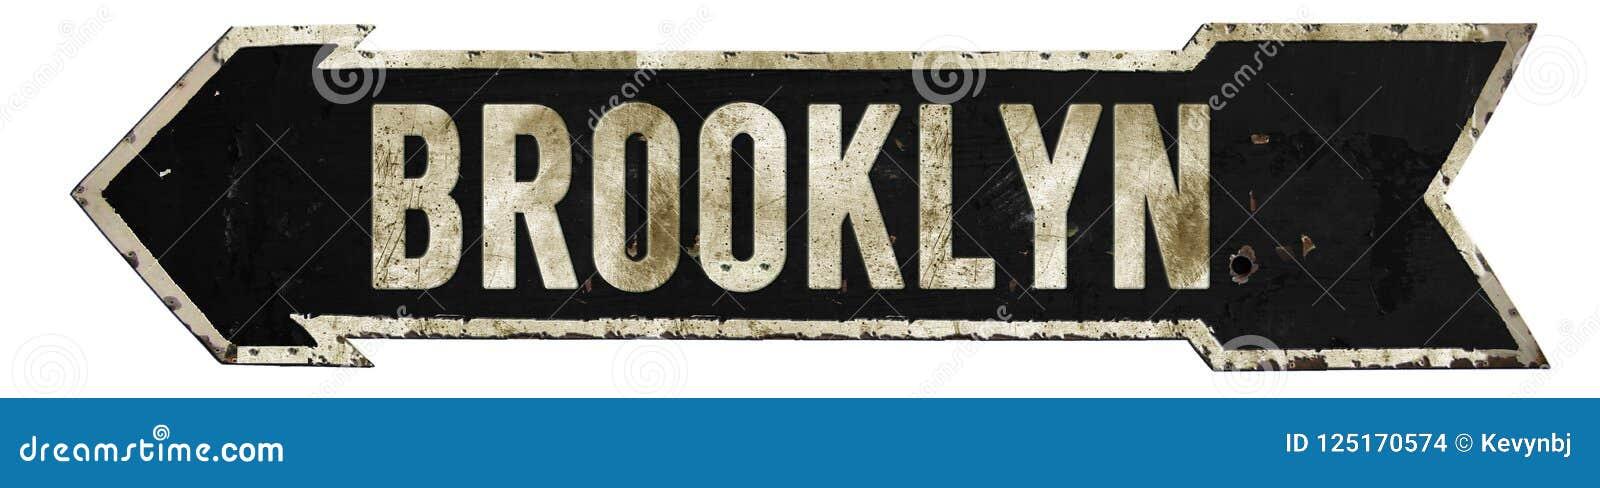 Seta do Grunge do sinal de rua de Brooklyn